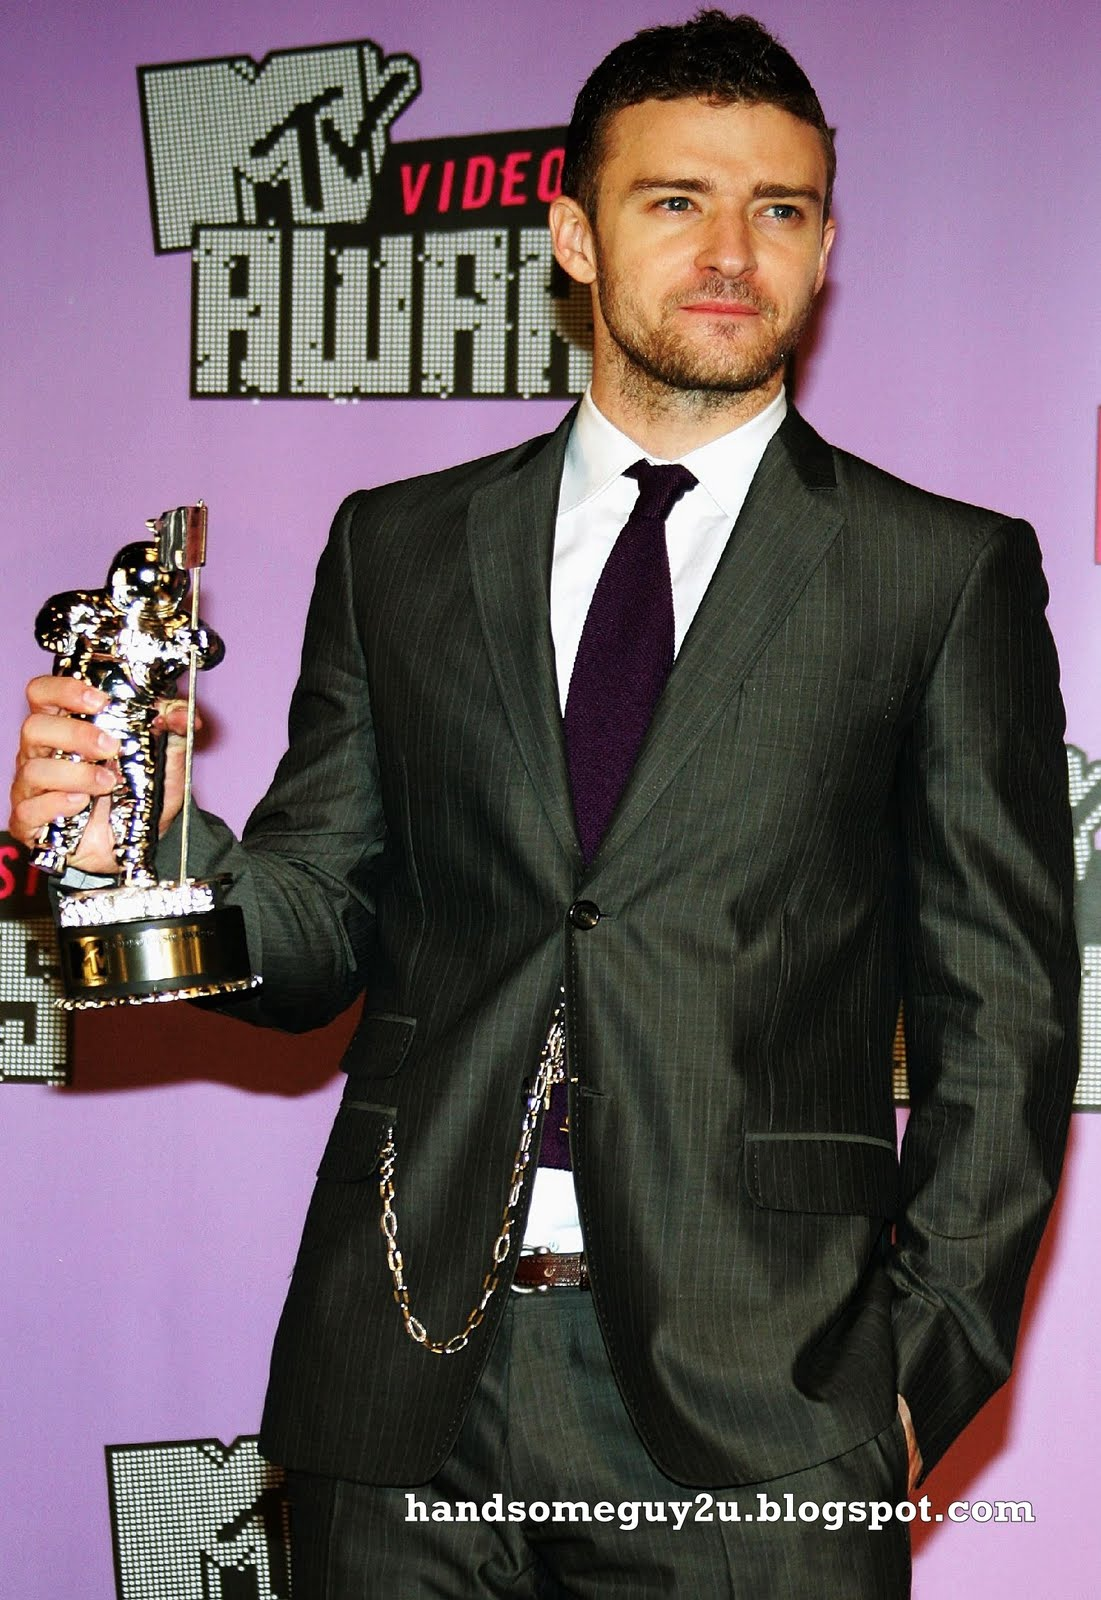 http://3.bp.blogspot.com/_rVJ5MmyyJR0/S9GA-Ob_hjI/AAAAAAAAA9E/N9CVop4e70c/s1600/Justin+Timberlake+7.jpg